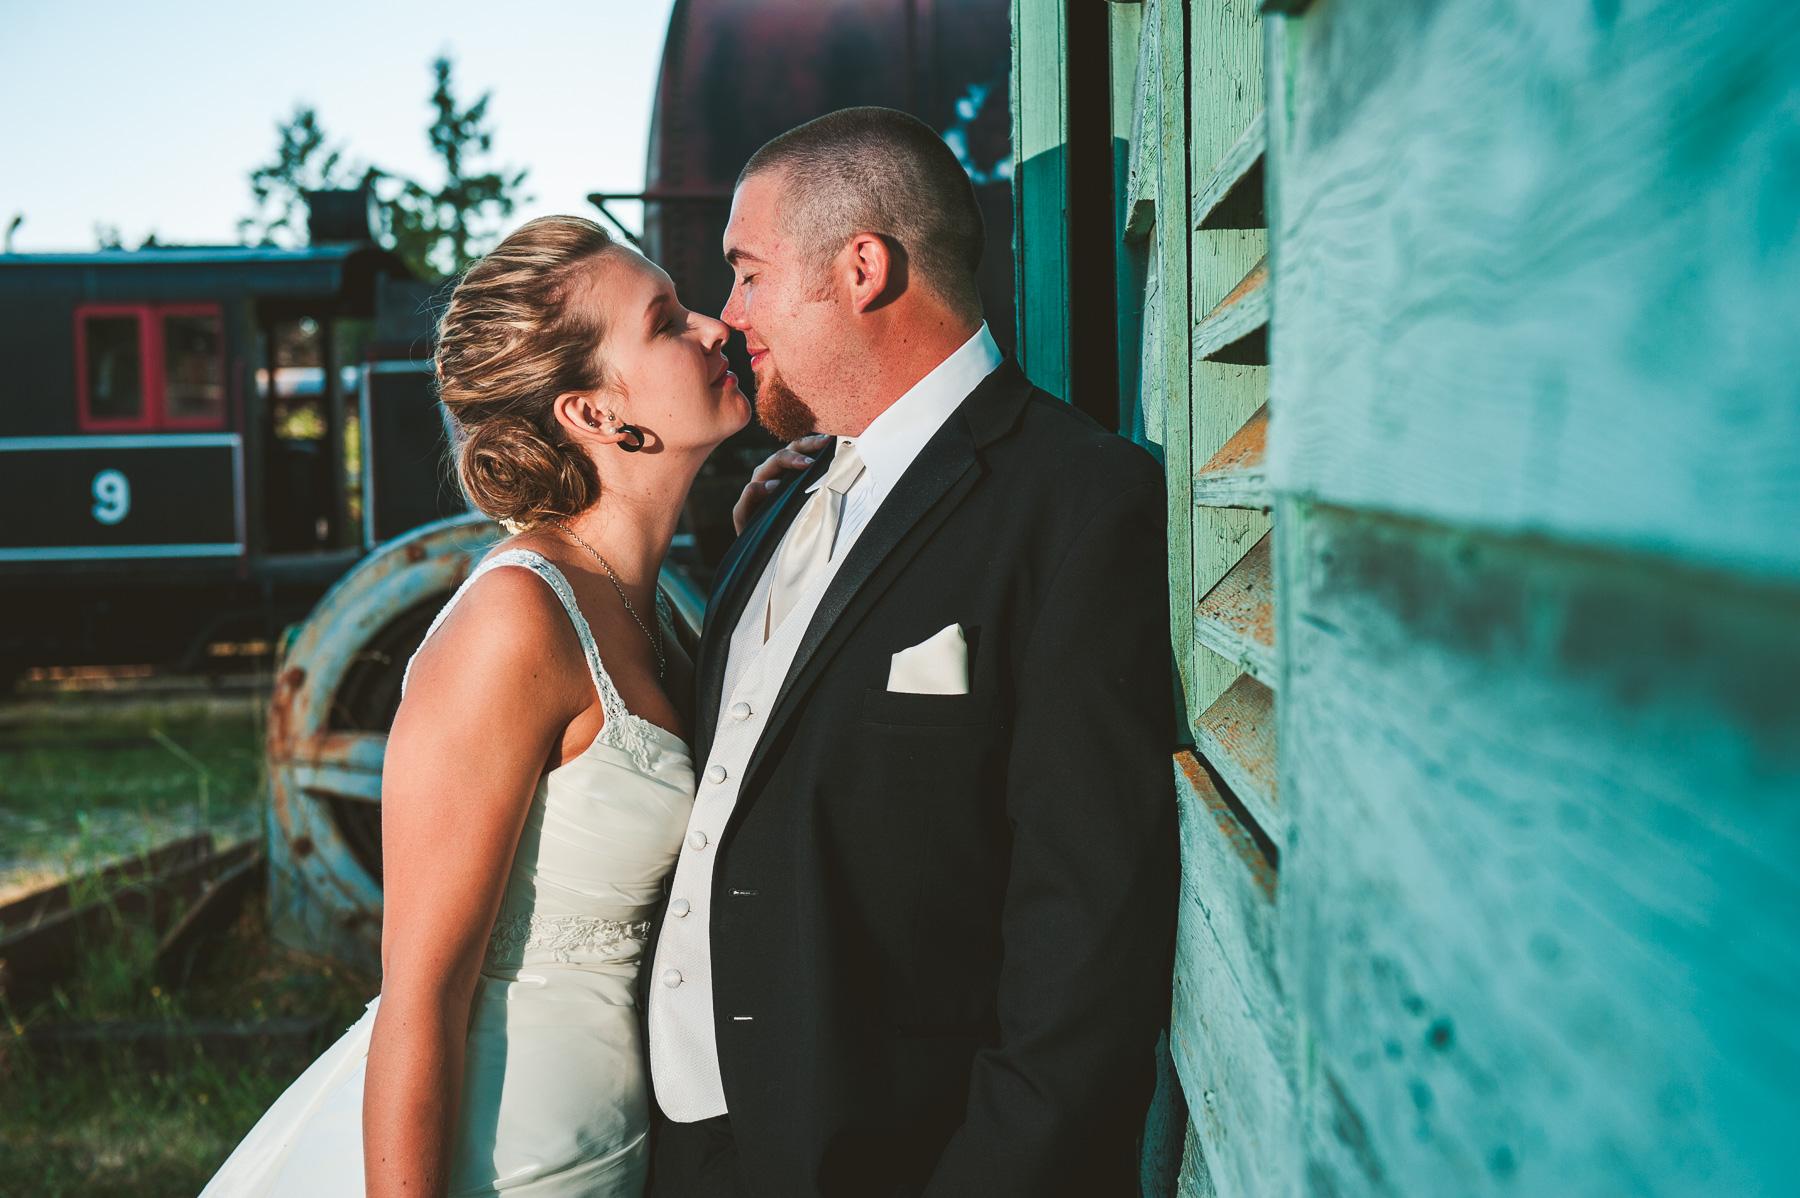 Victoria-BC-Wedding-Photography-36.jpg